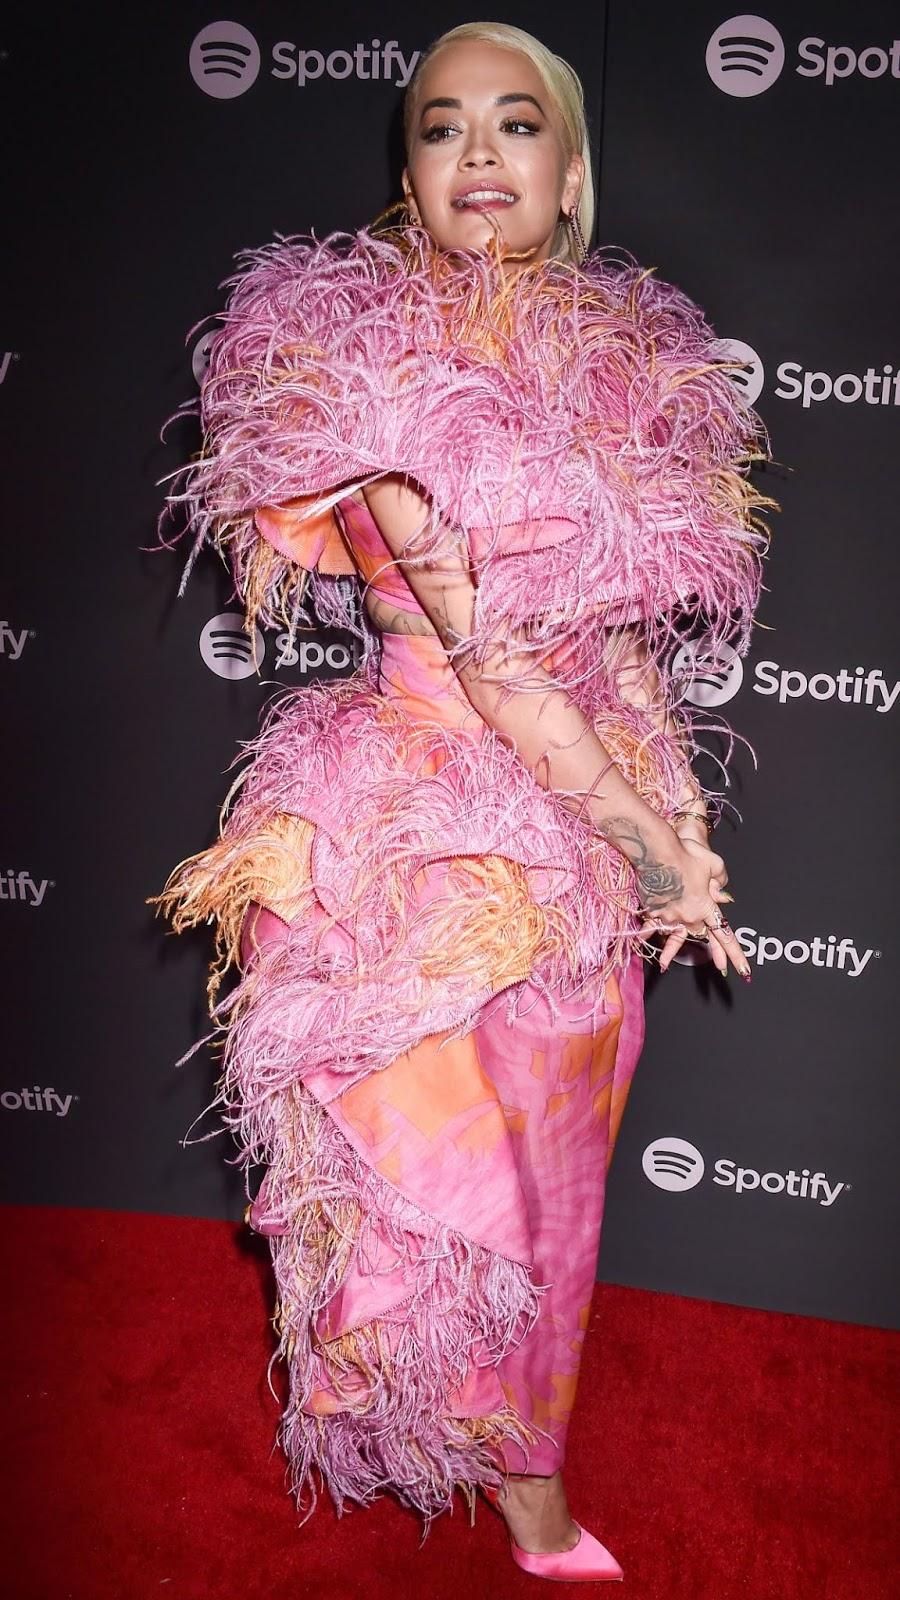 Rita Ora - Spotify Best New Artist 2019 event in LA - 02/07/2019